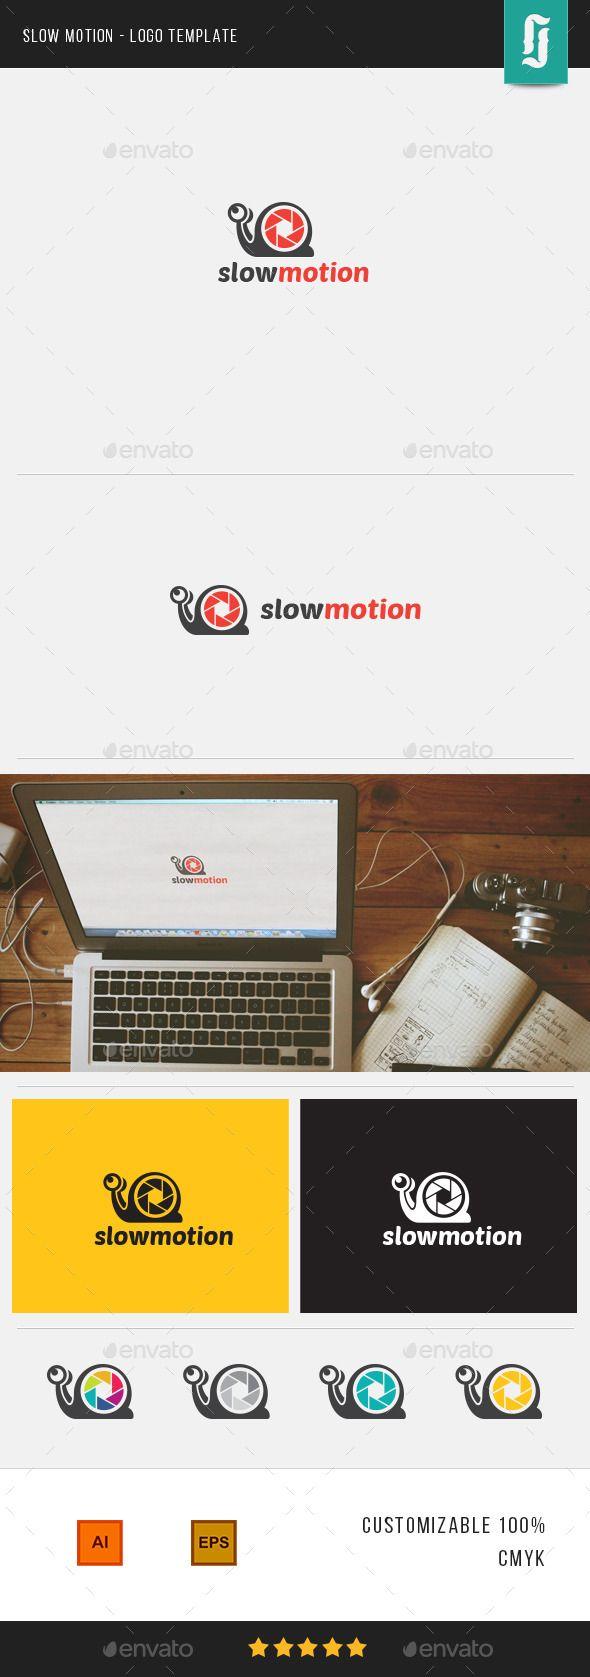 Slow Motion - Logo Template | Motion logo, Logo templates and Logos